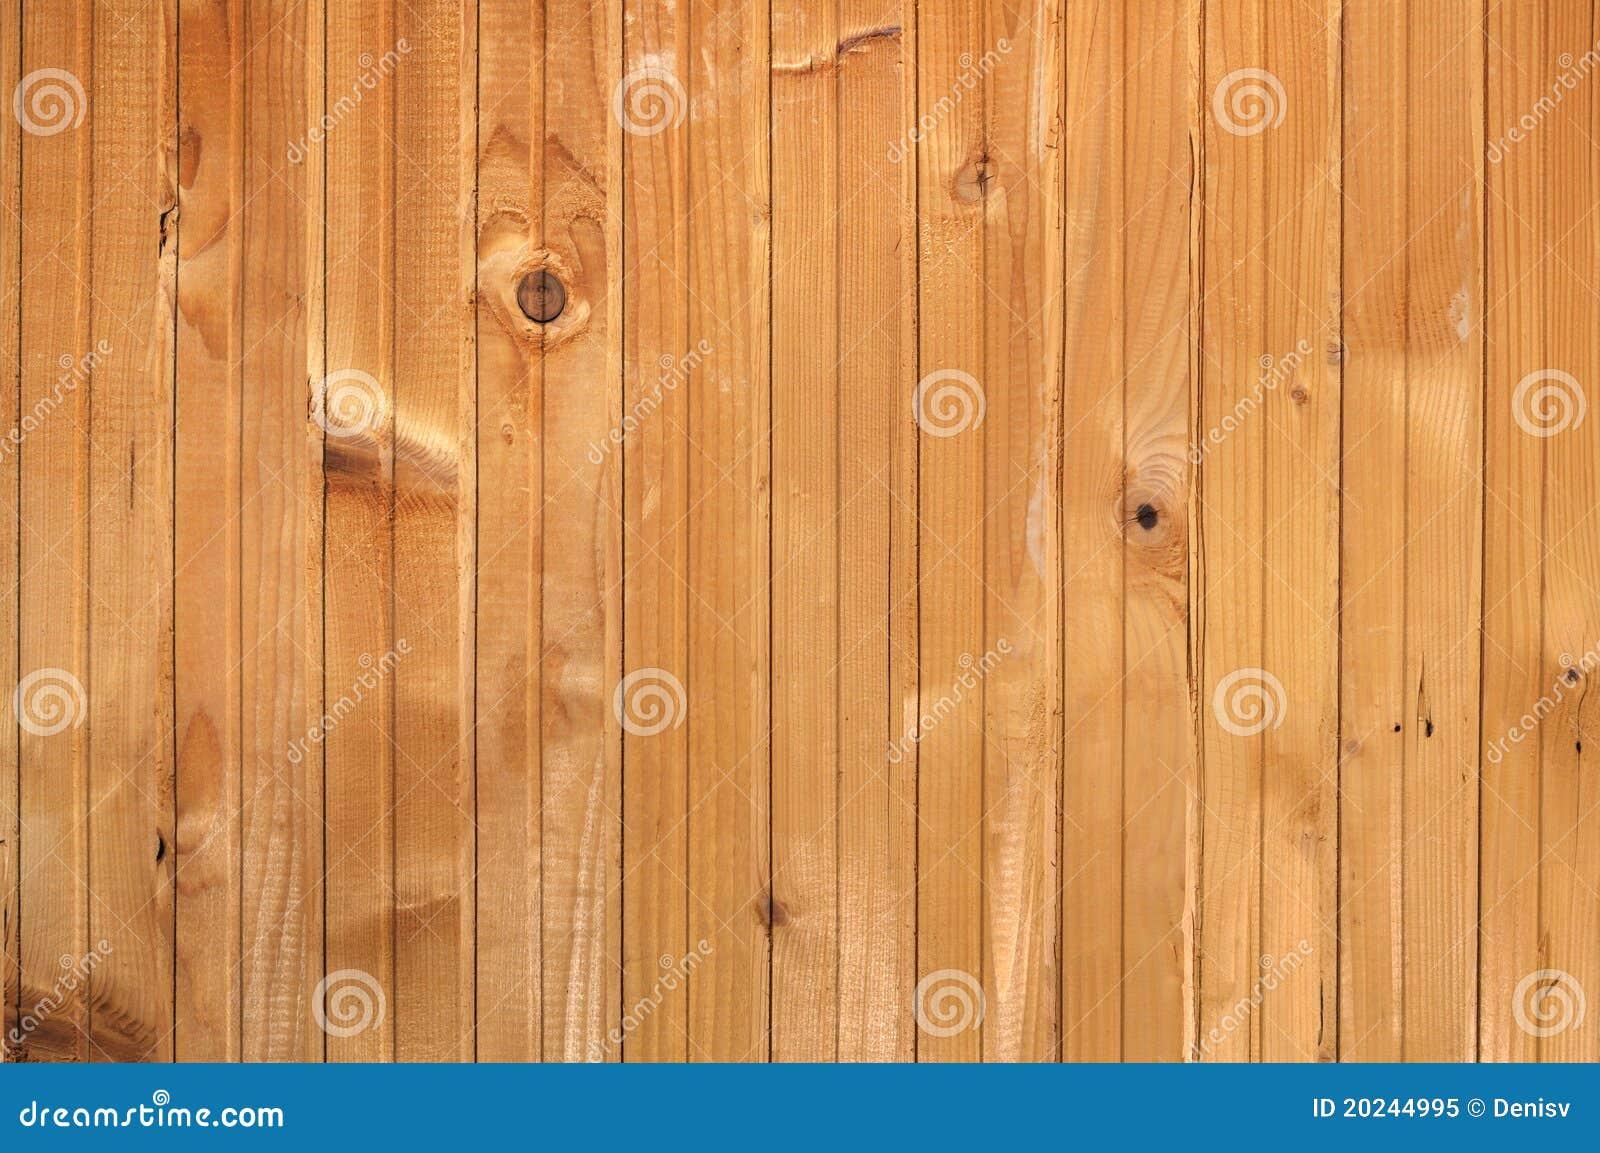 Kleen strip wood bleach msds